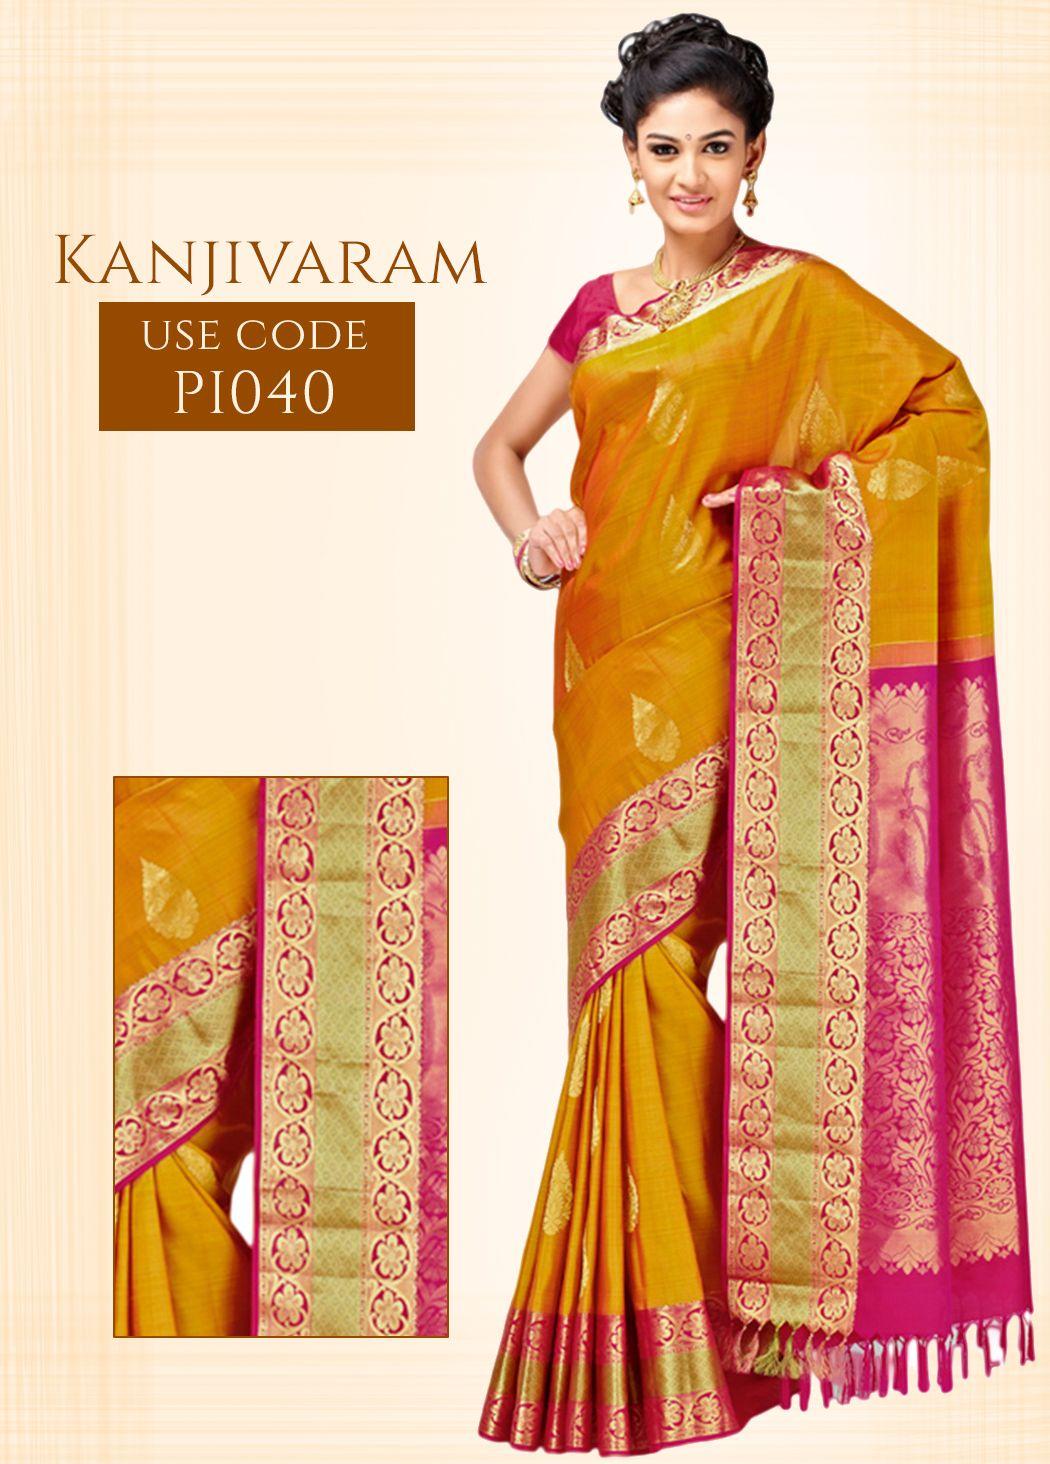 ac6cd4a7c0 Rust Kanjivaram Pure Silk Saree, with Golden Zari Brocade Border and  Magenta Colored Pallu. To Buy This Saree, Just Click Here:goo.gl/X2DWg0 ...